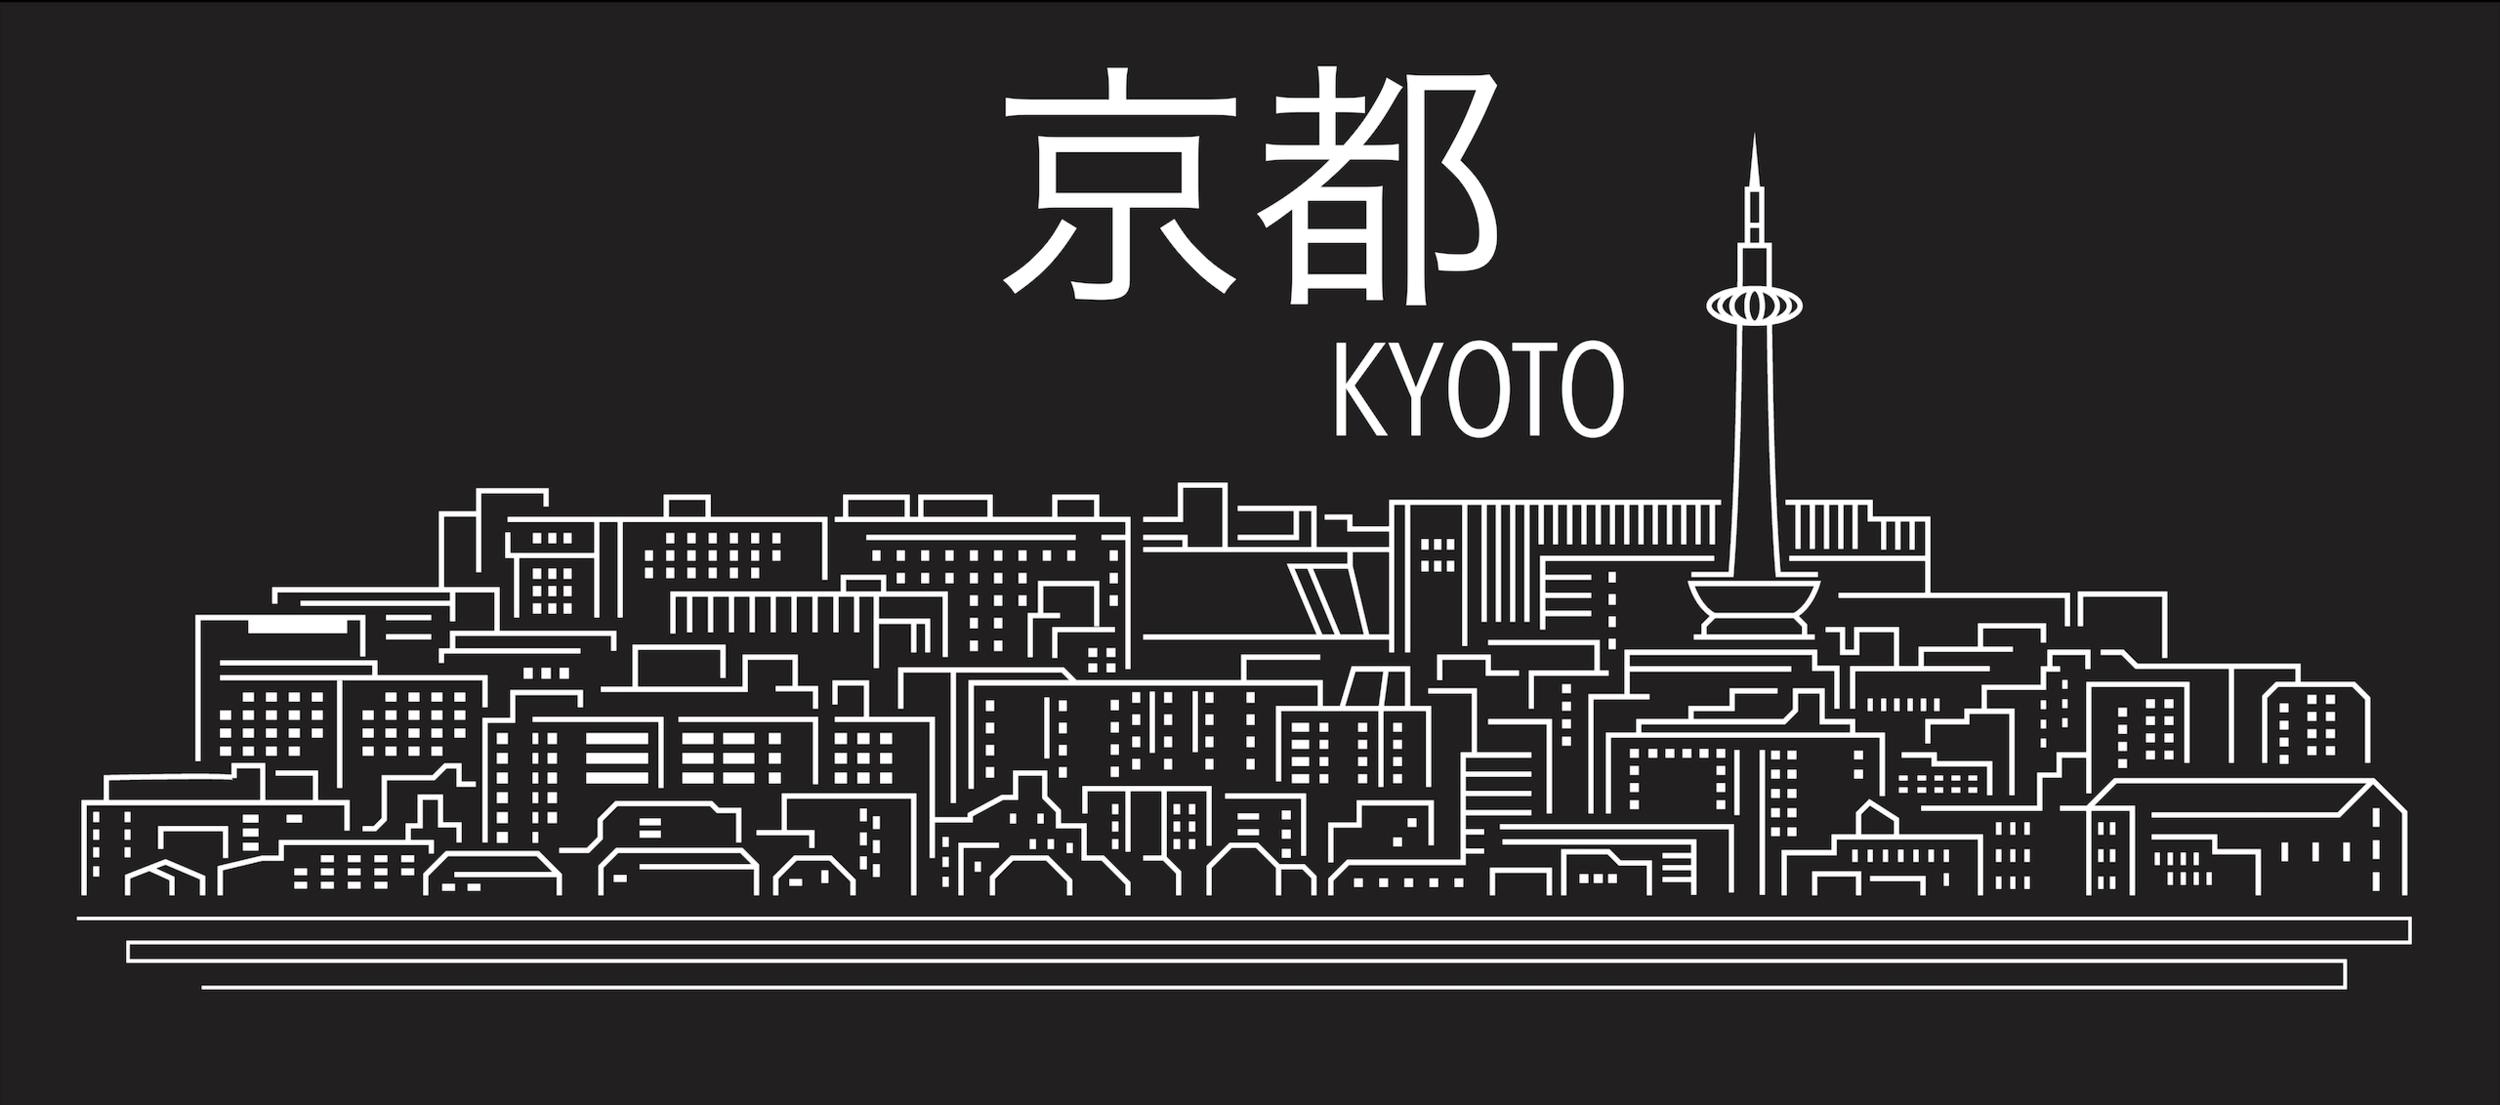 kyoto jpeg 2.jpg